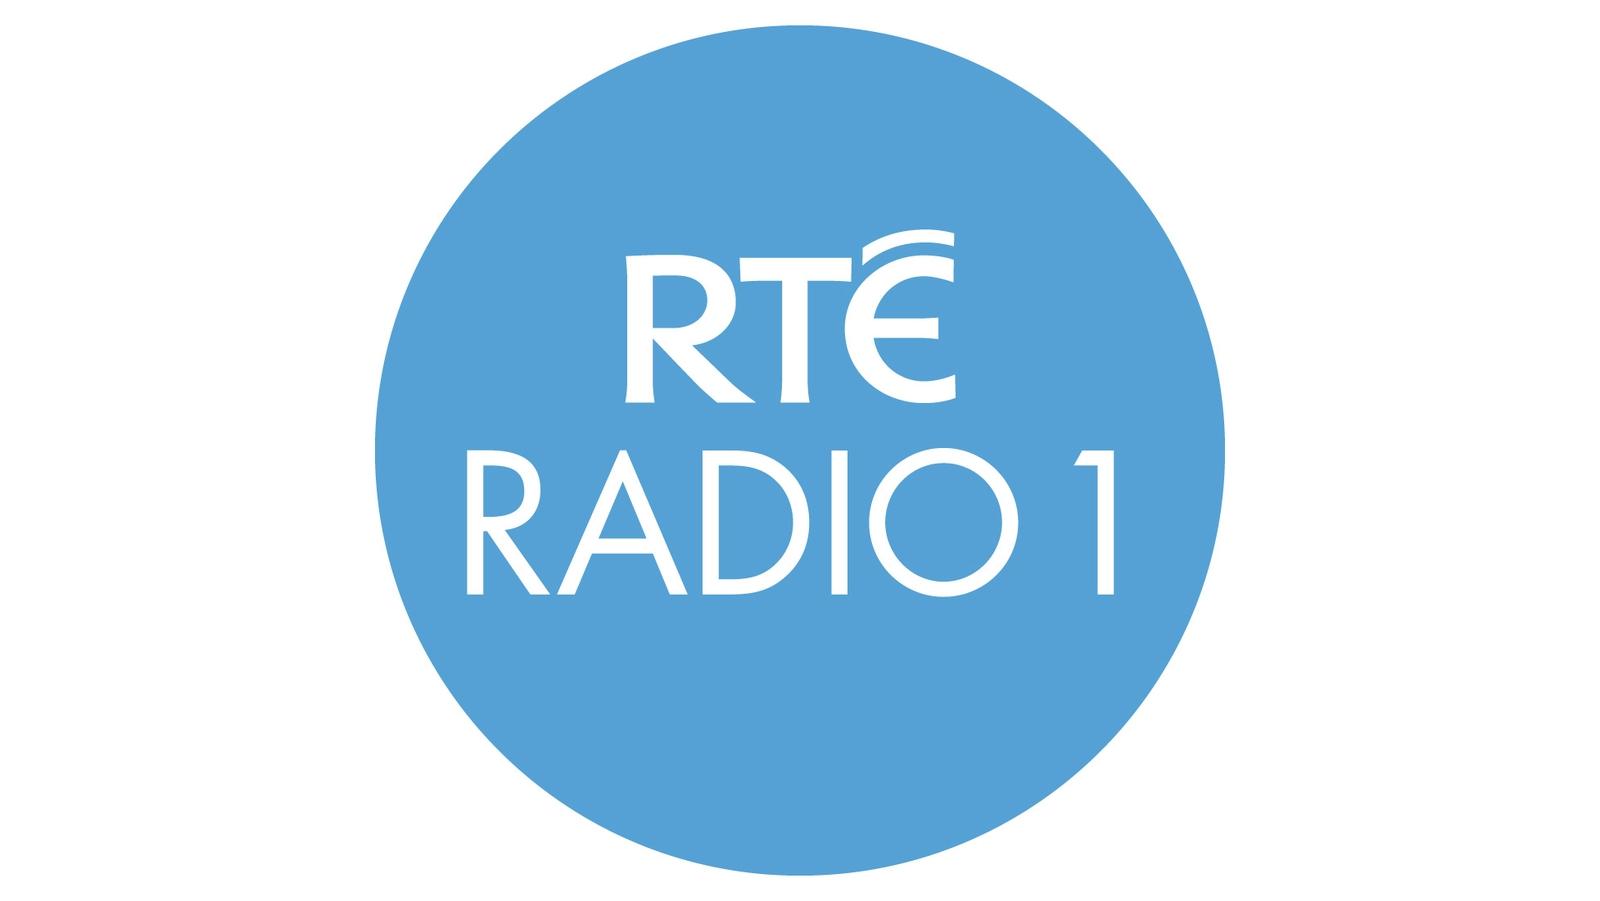 - Ray Darcy Show- RTE Radio 1